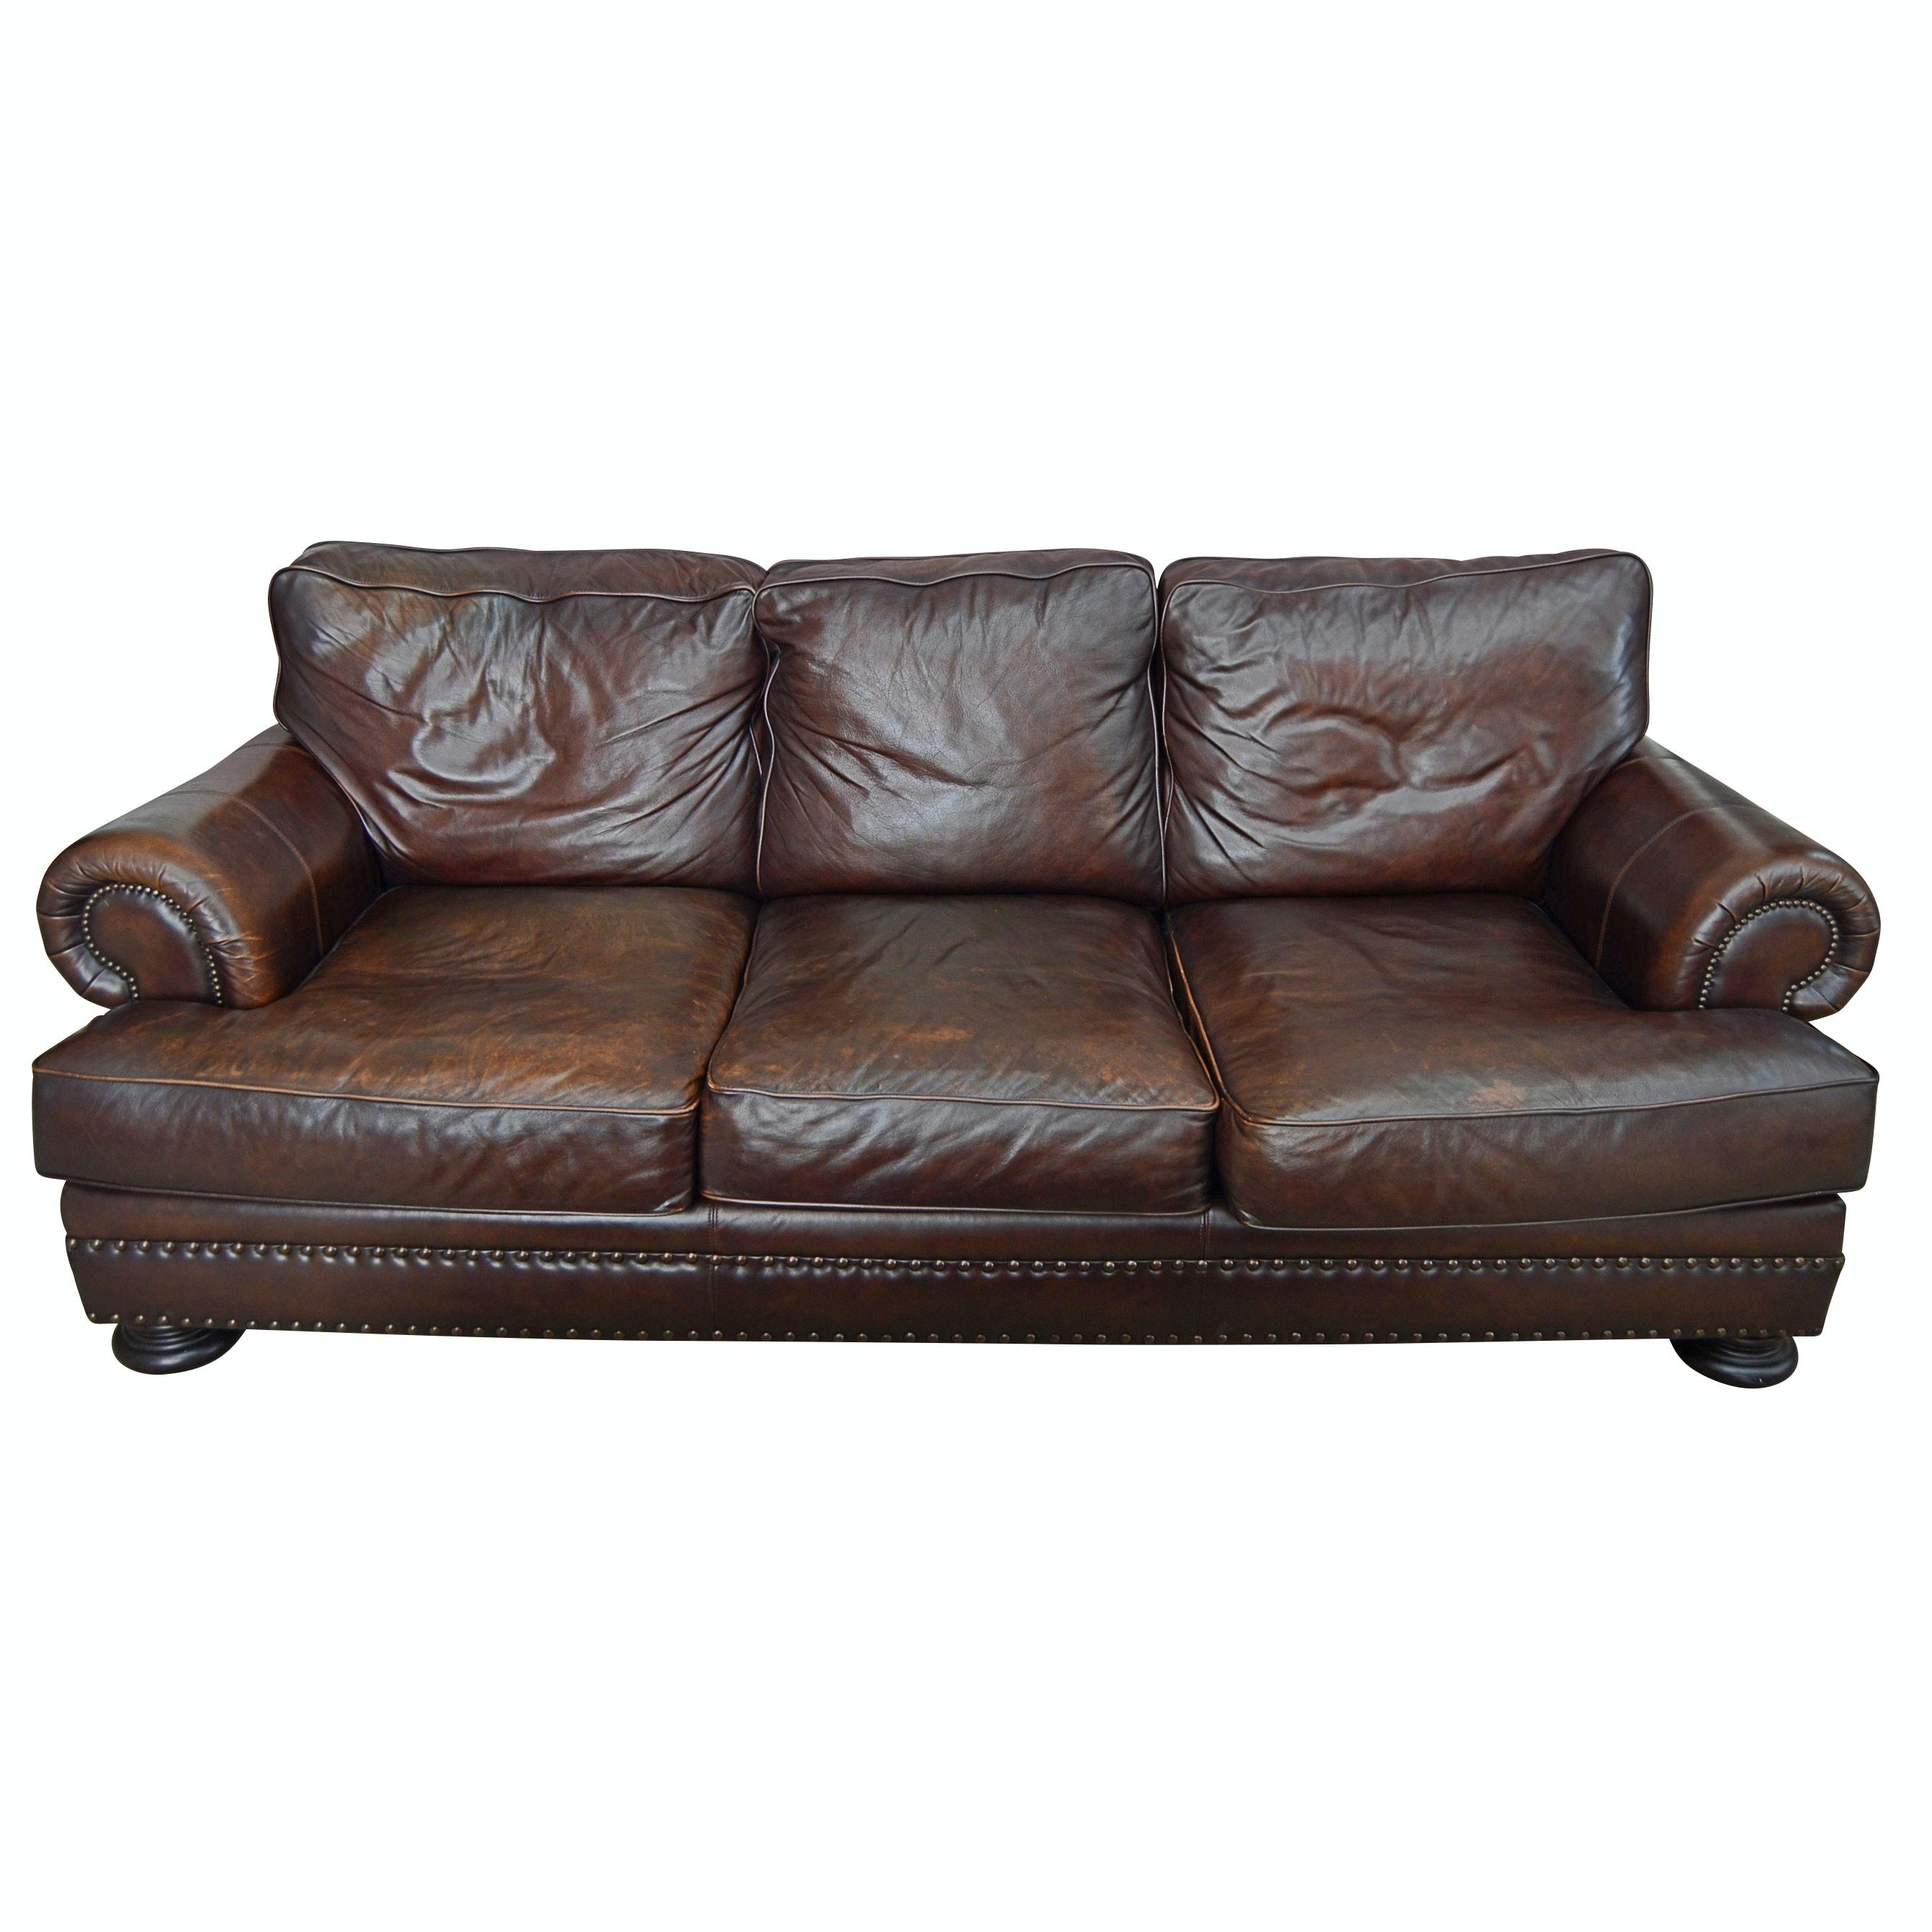 Contemporary Bernhardt Brown Leather Sofa